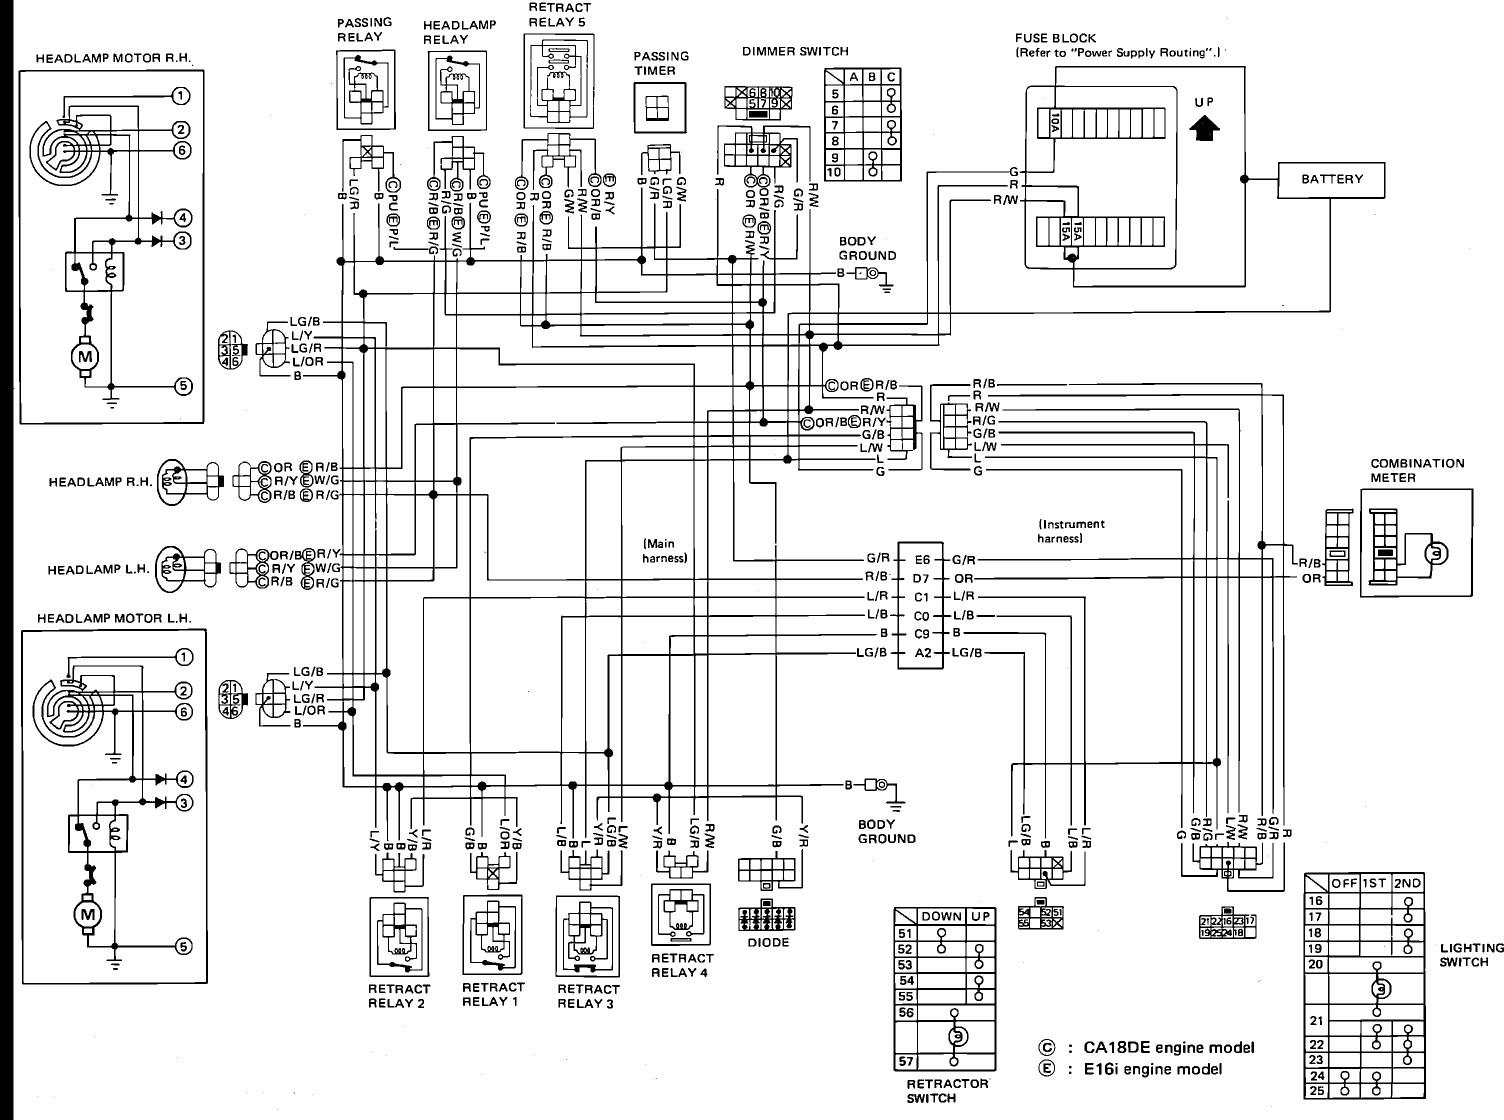 Radio Wiring Diagram For Nissan Altima